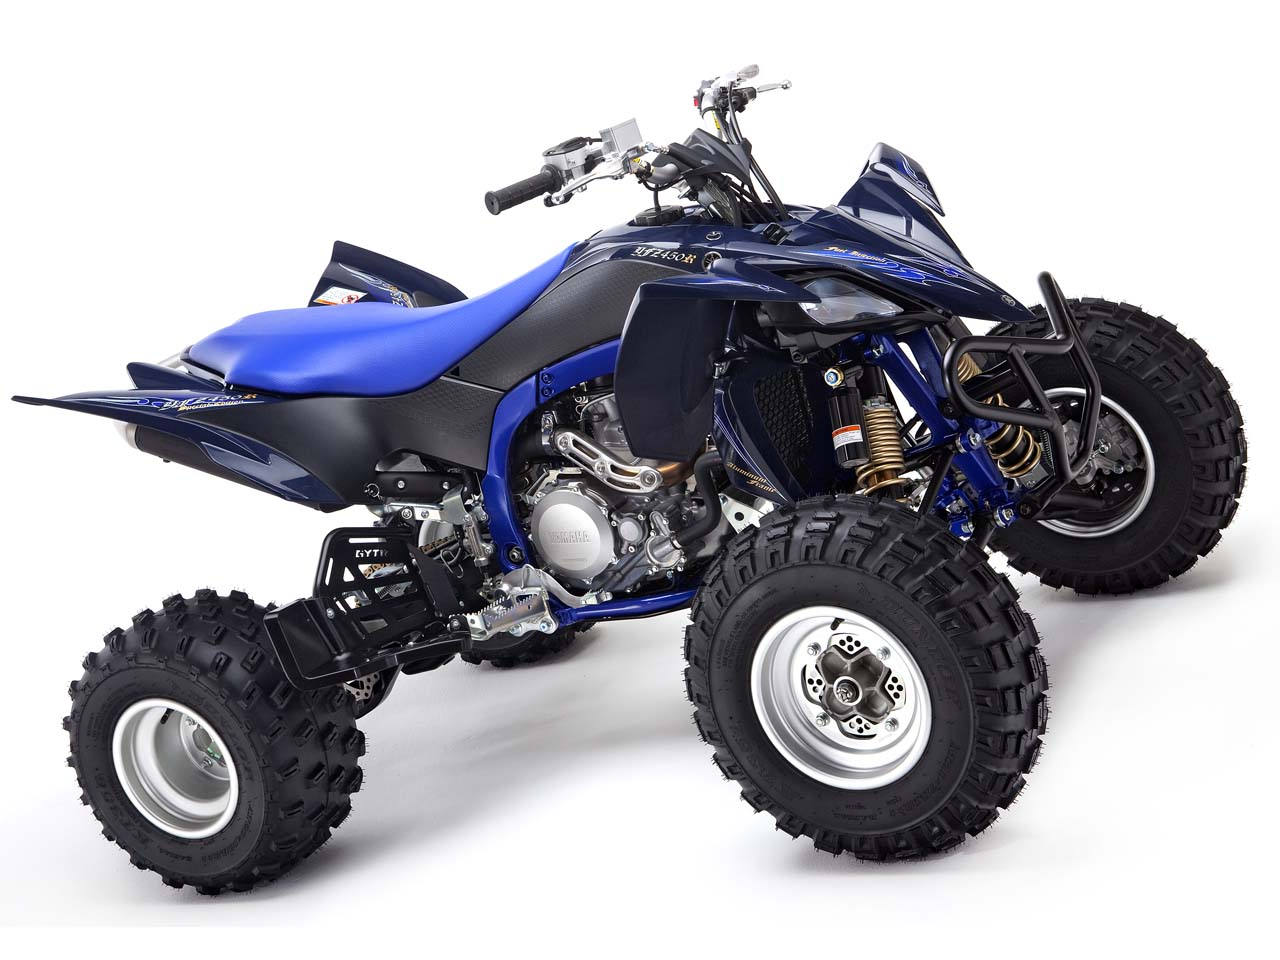 Sand storm yamaha special edition sport atvs atv for Yamaha atv yfz450